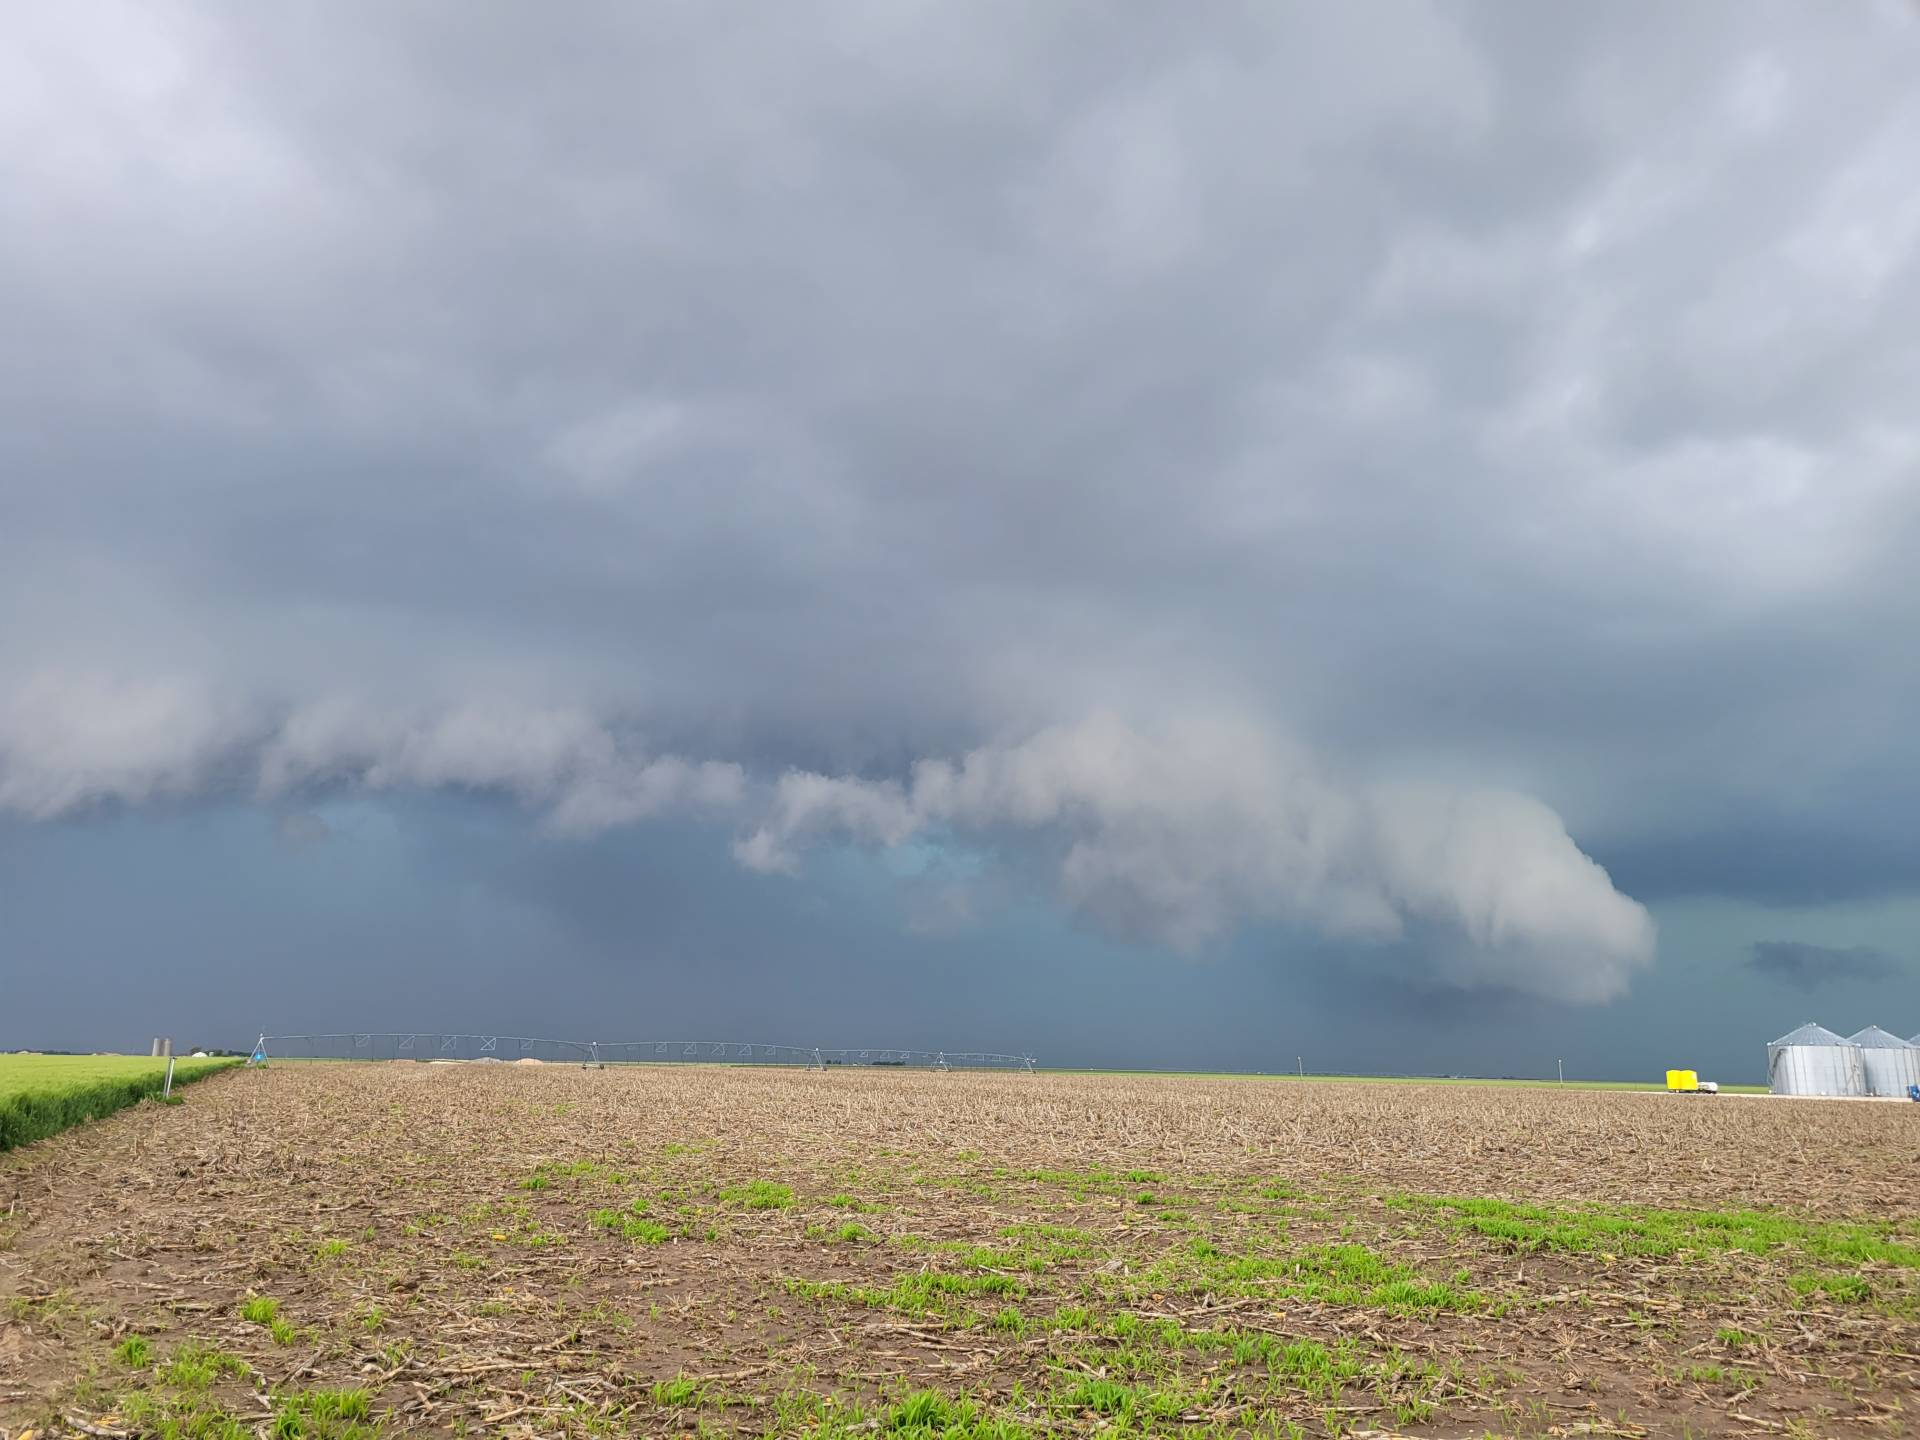 Gusty storm near Pence, Kansas. #kswx